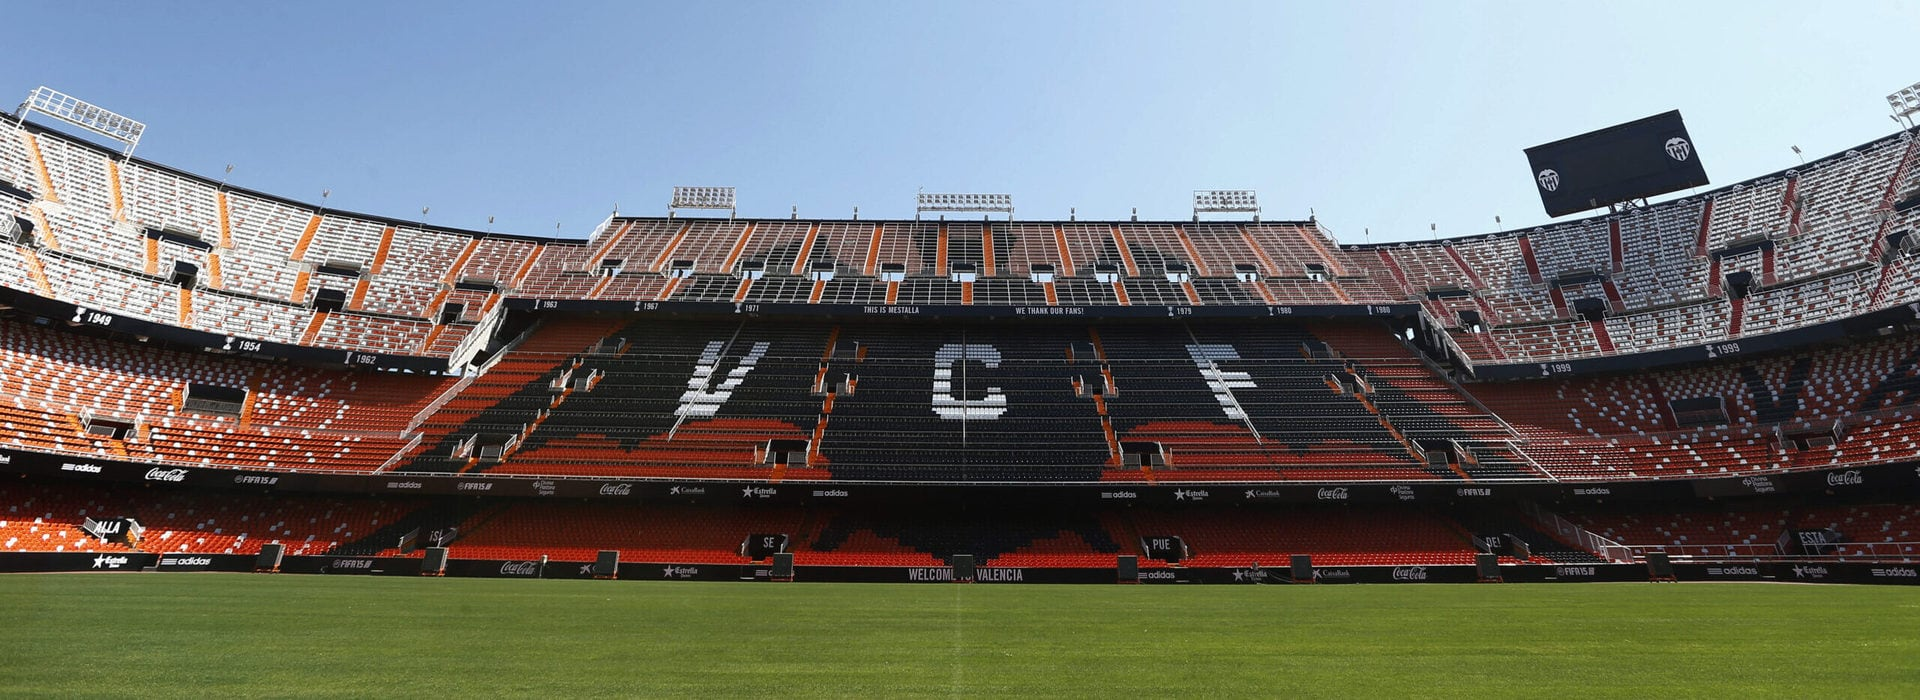 Studietur Valencia stadion